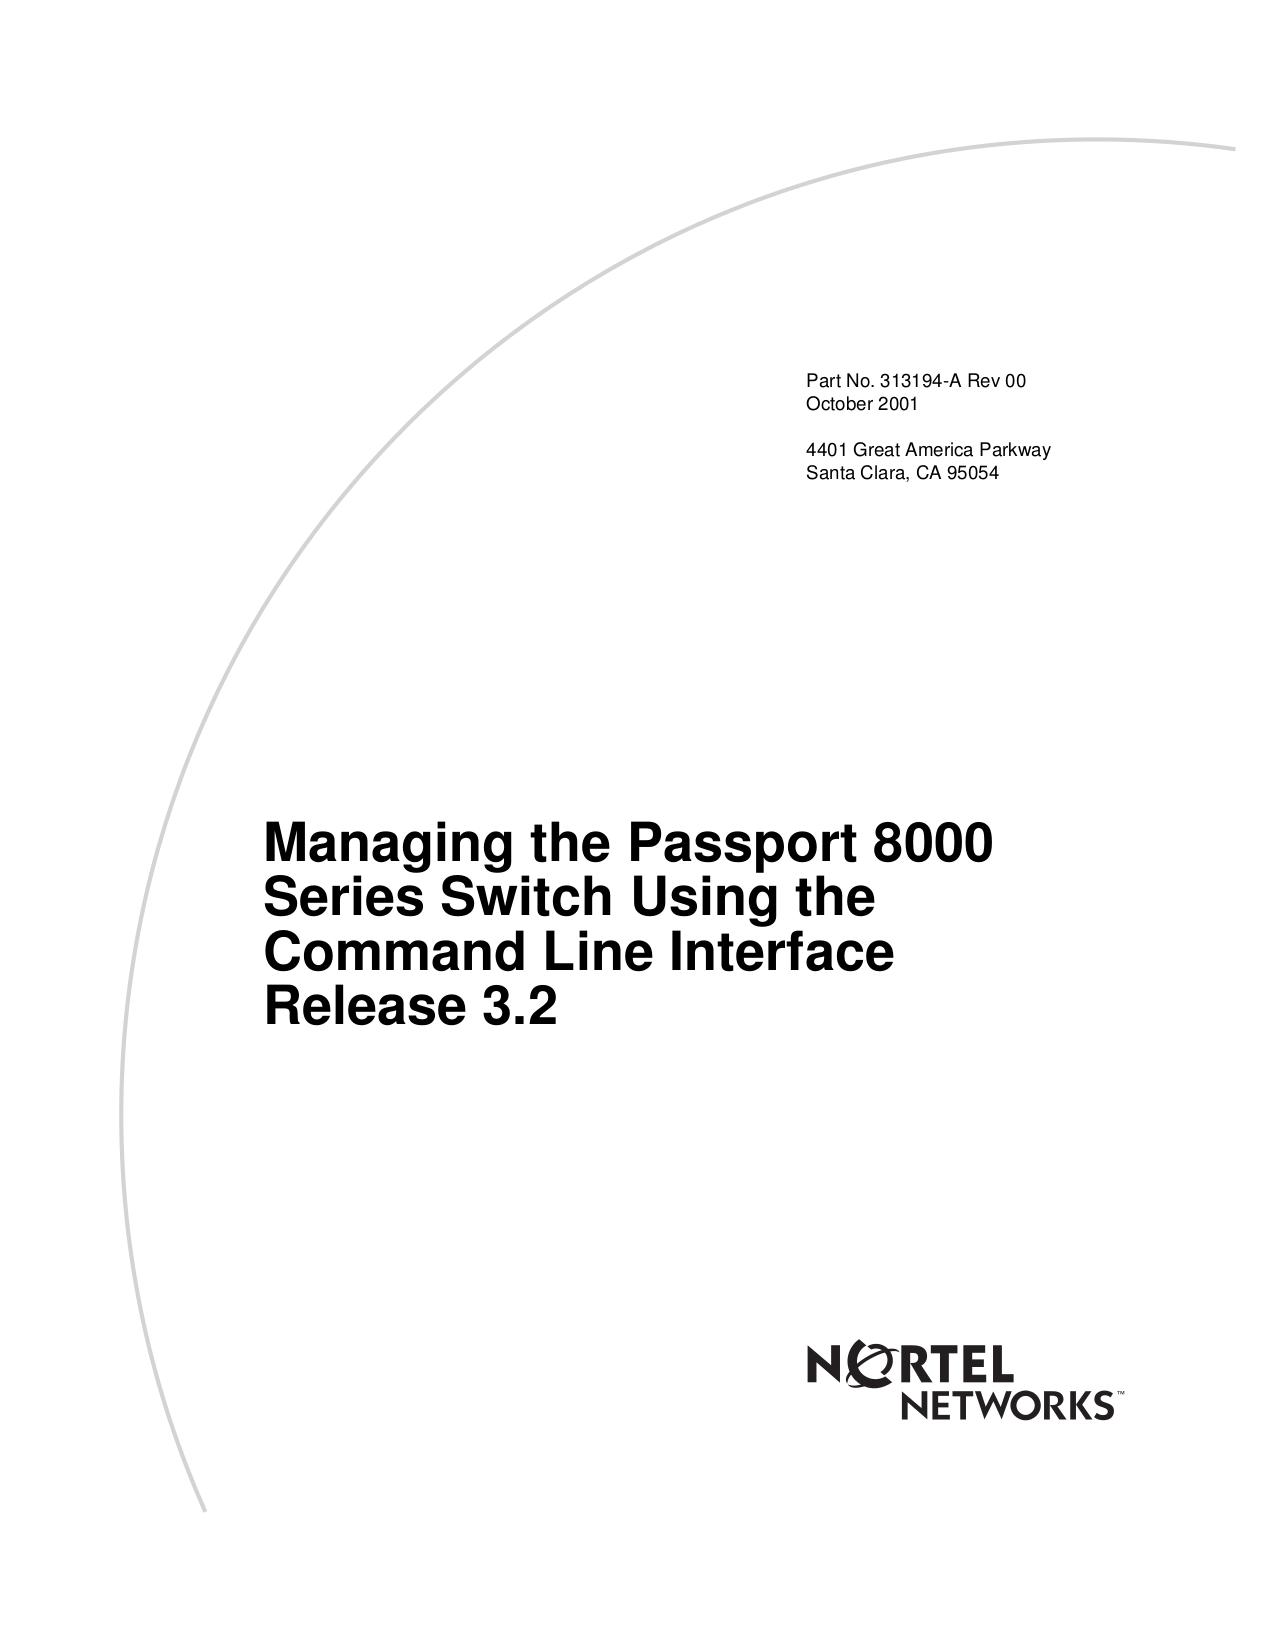 pdf for Nortel Switch Passport 8600 manual